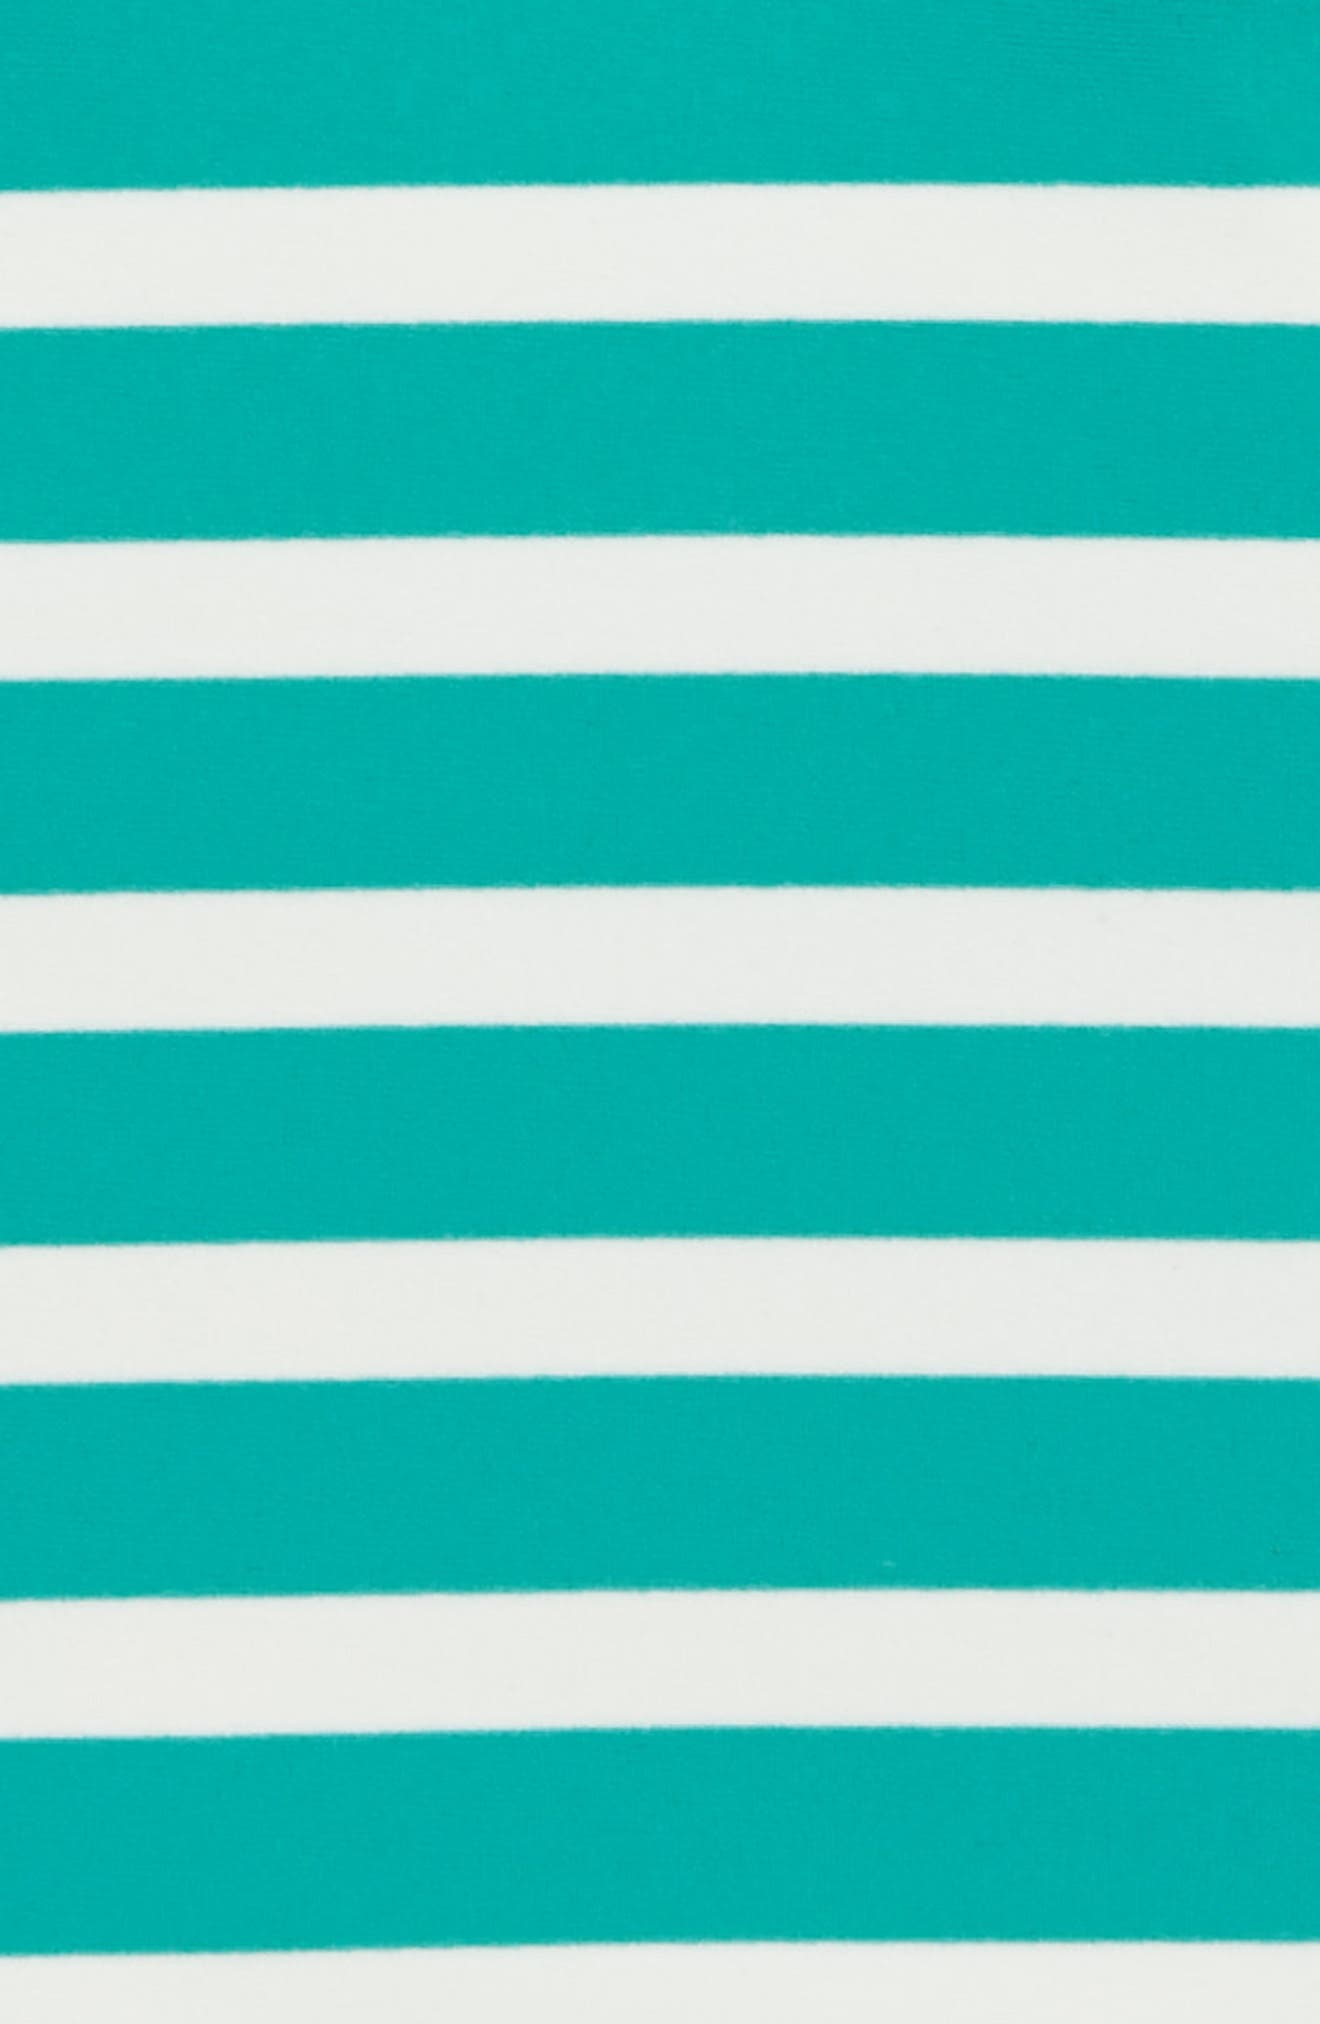 Racerback Tankini Top,                             Alternate thumbnail 2, color,                             Mermaid Tonal Stripe